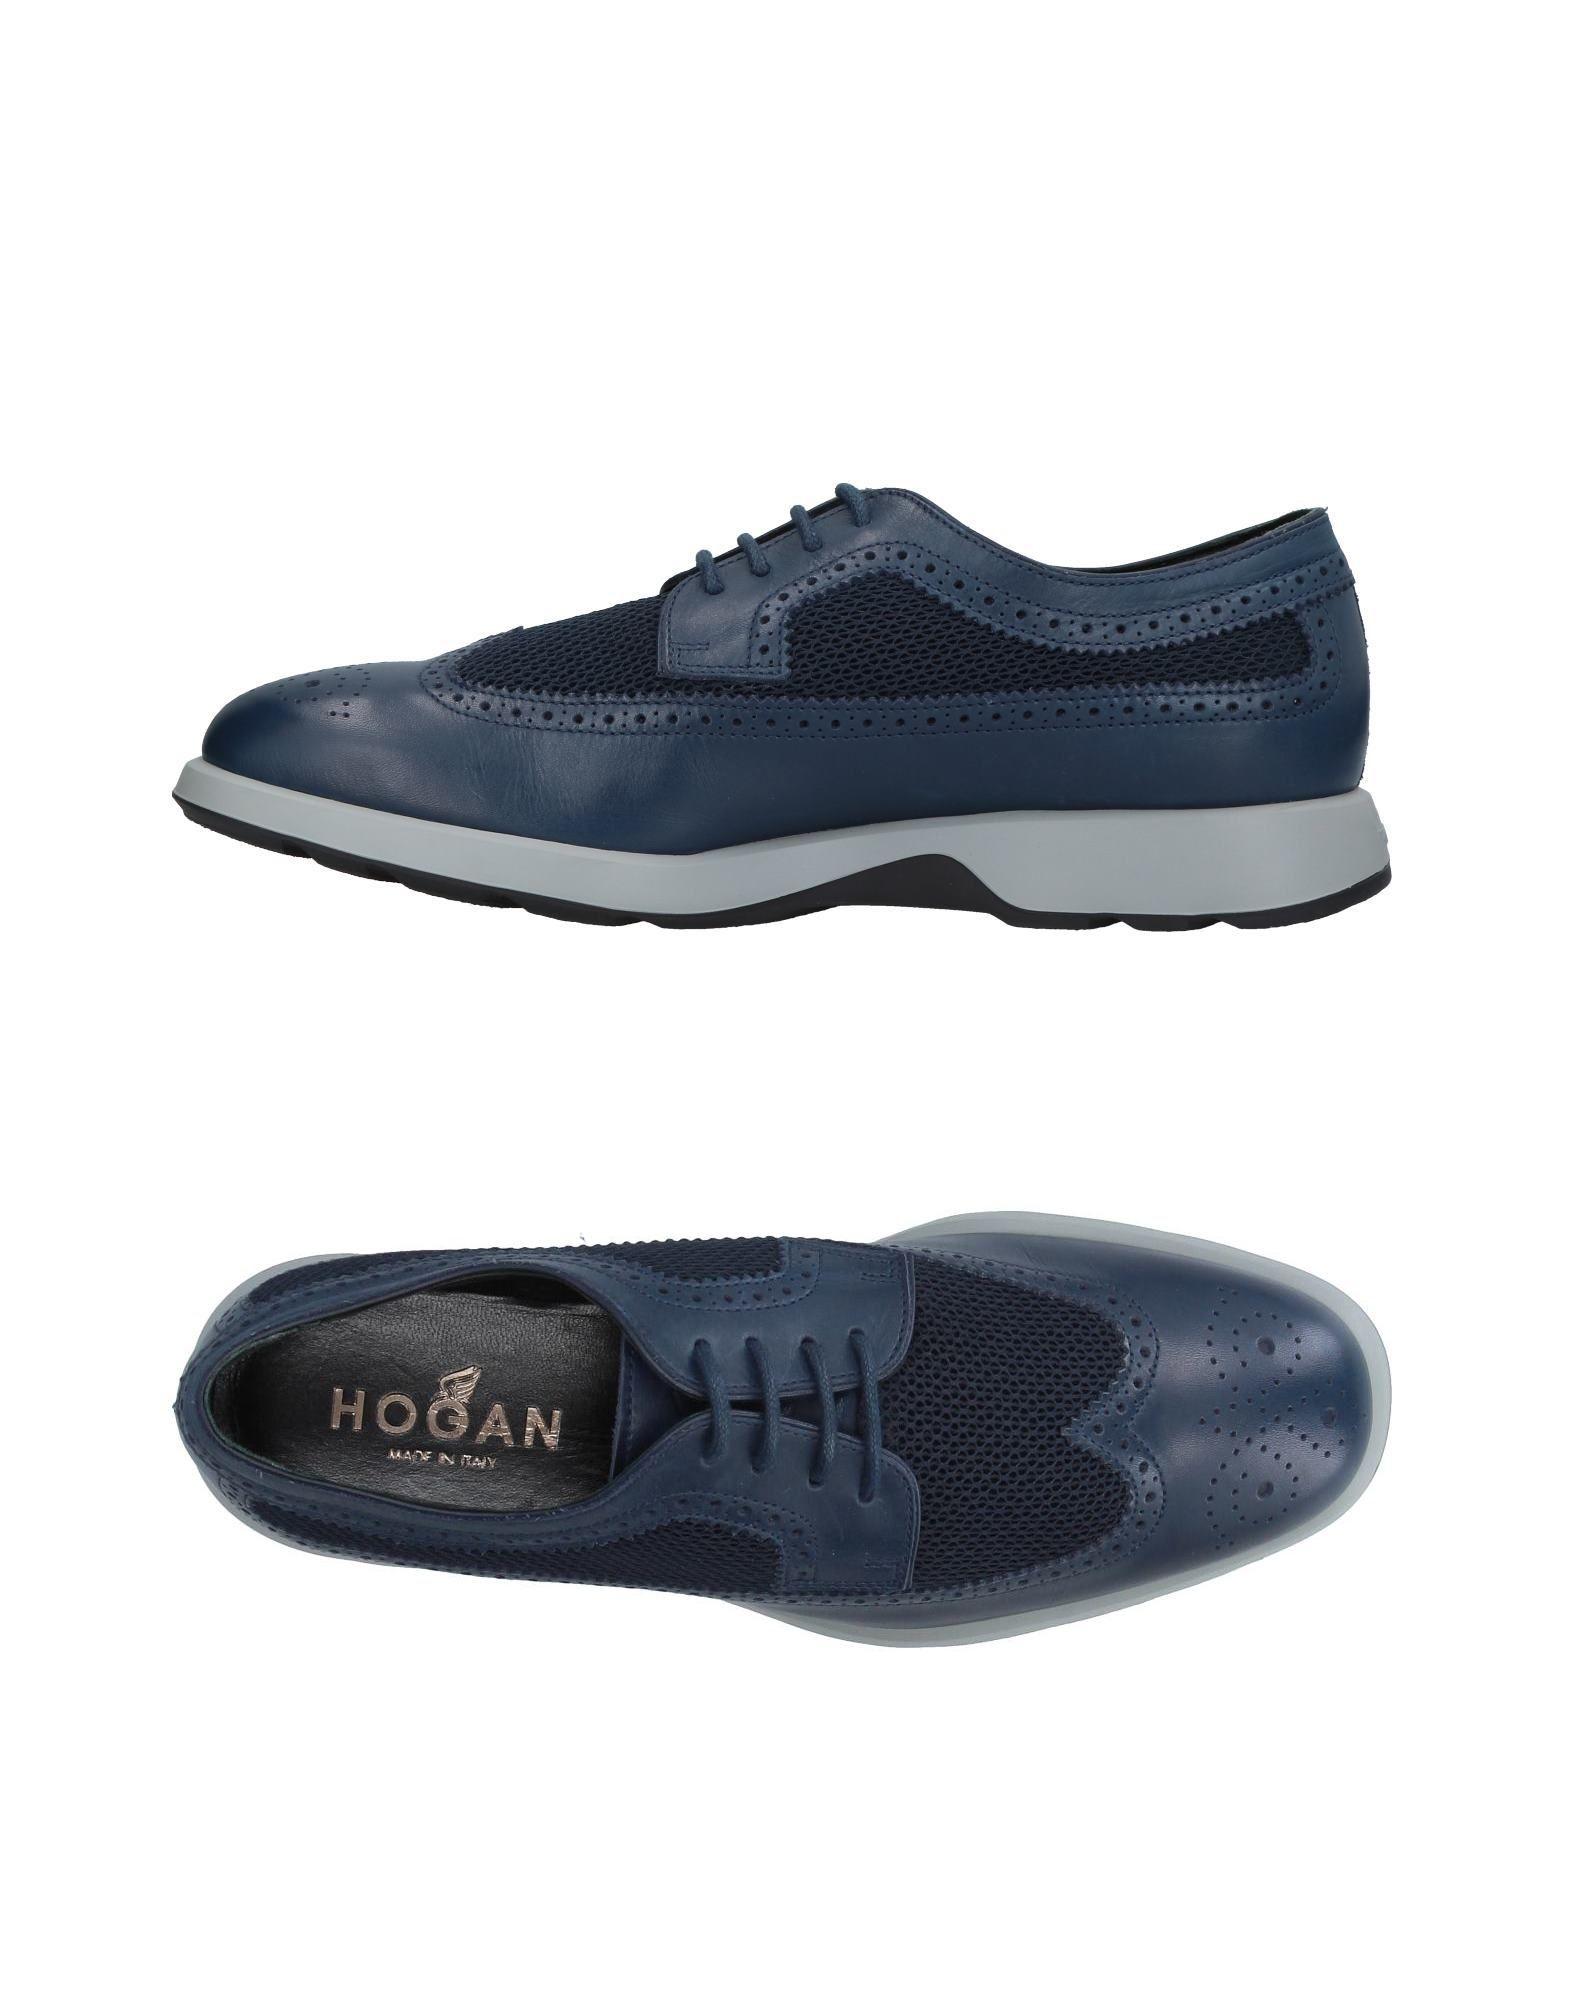 Stringate Hogan Uomo - 11397035JP elegante